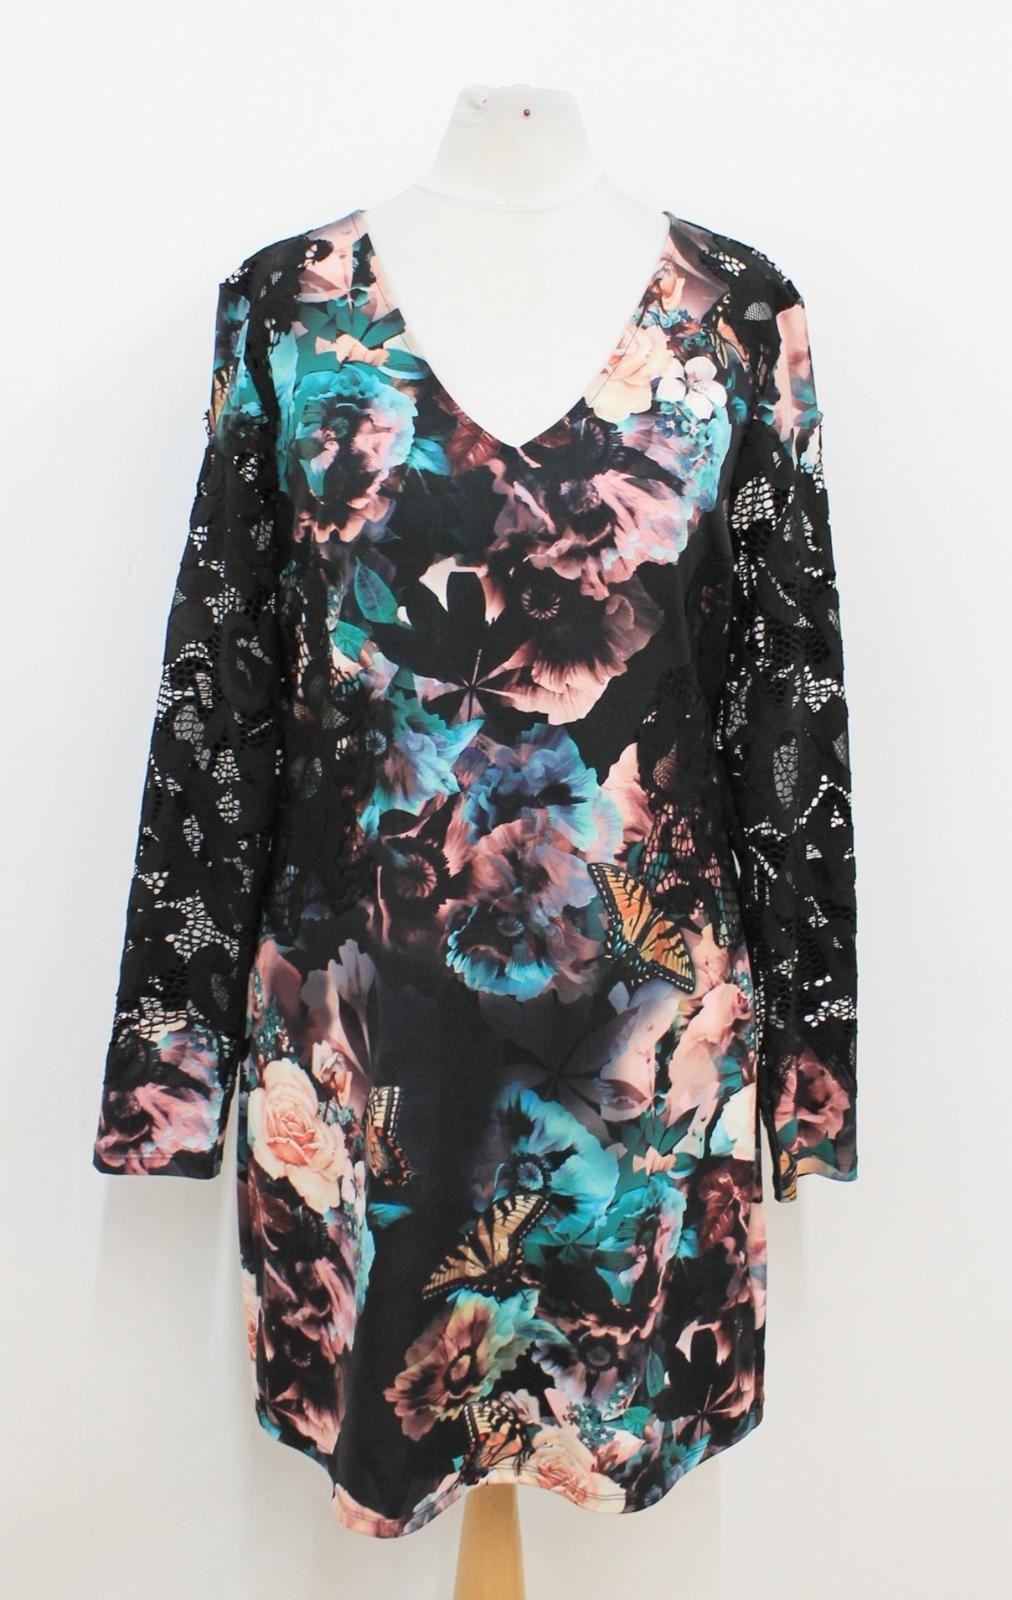 STAR-BY-JULIEN-MCDONALD-Ladies-Black-Lace-Bright-floral-Print-V-Neck-Dress-UK12